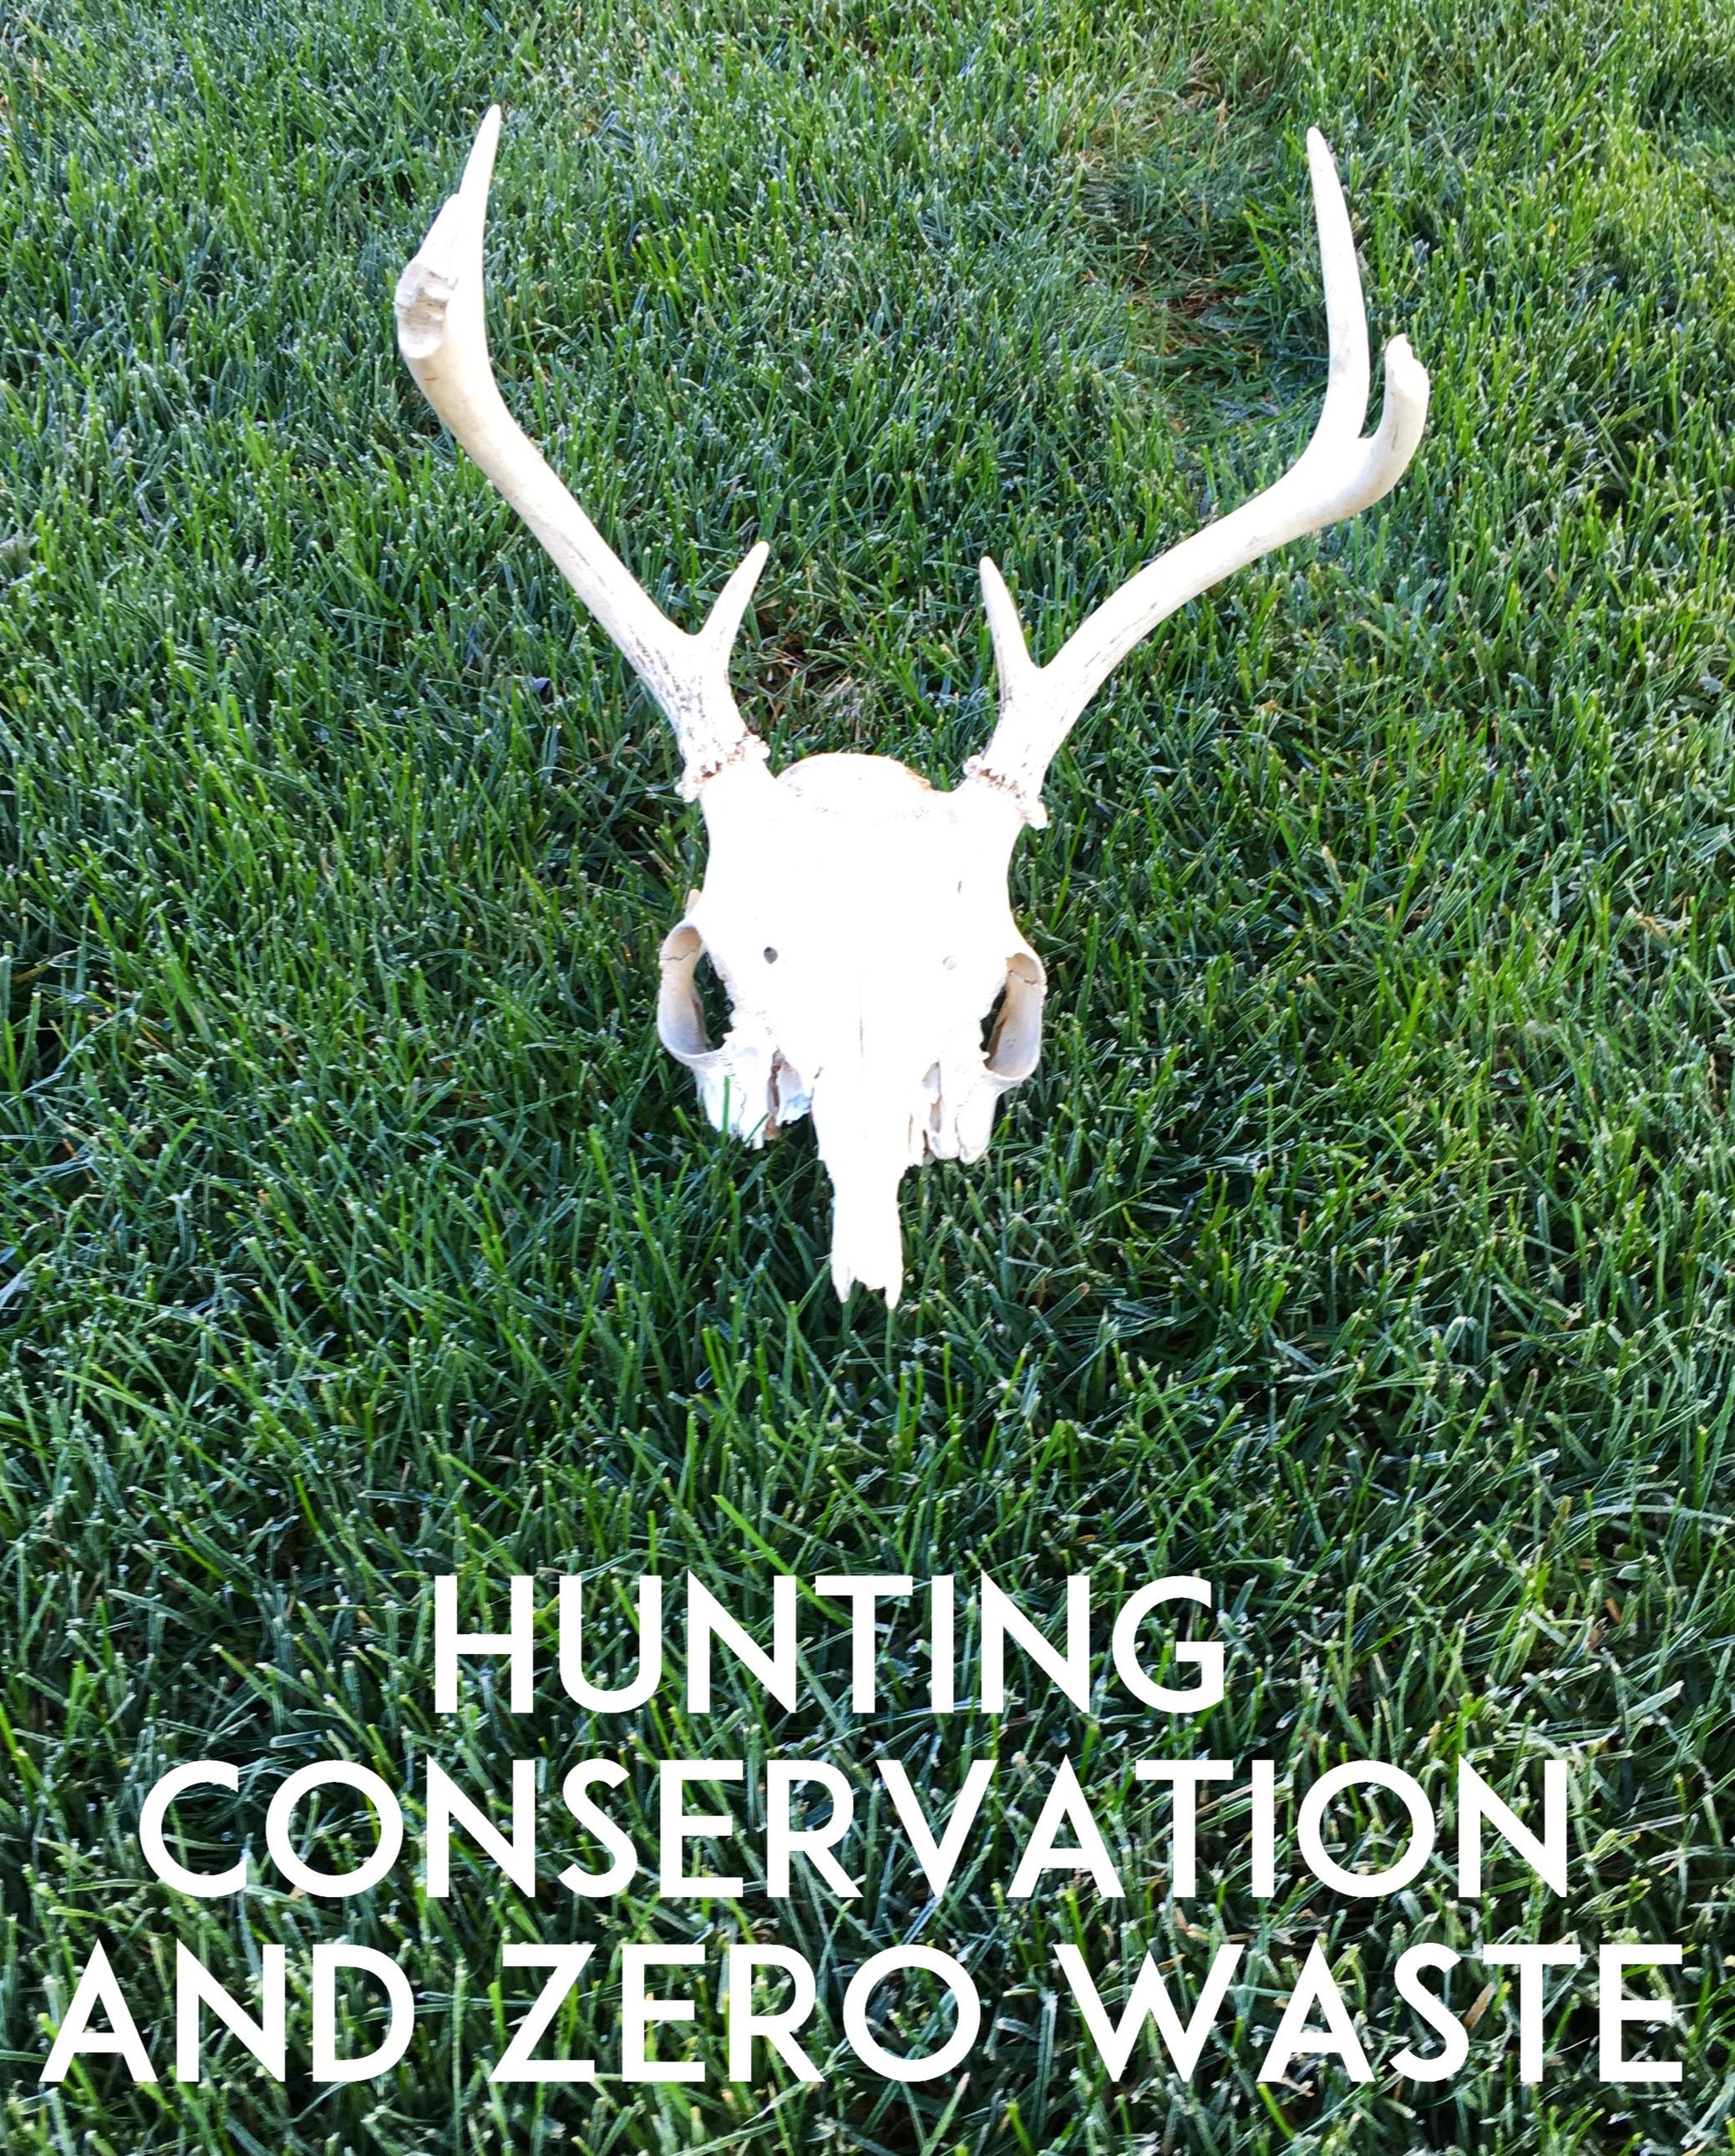 huntingthumbnew.jpg